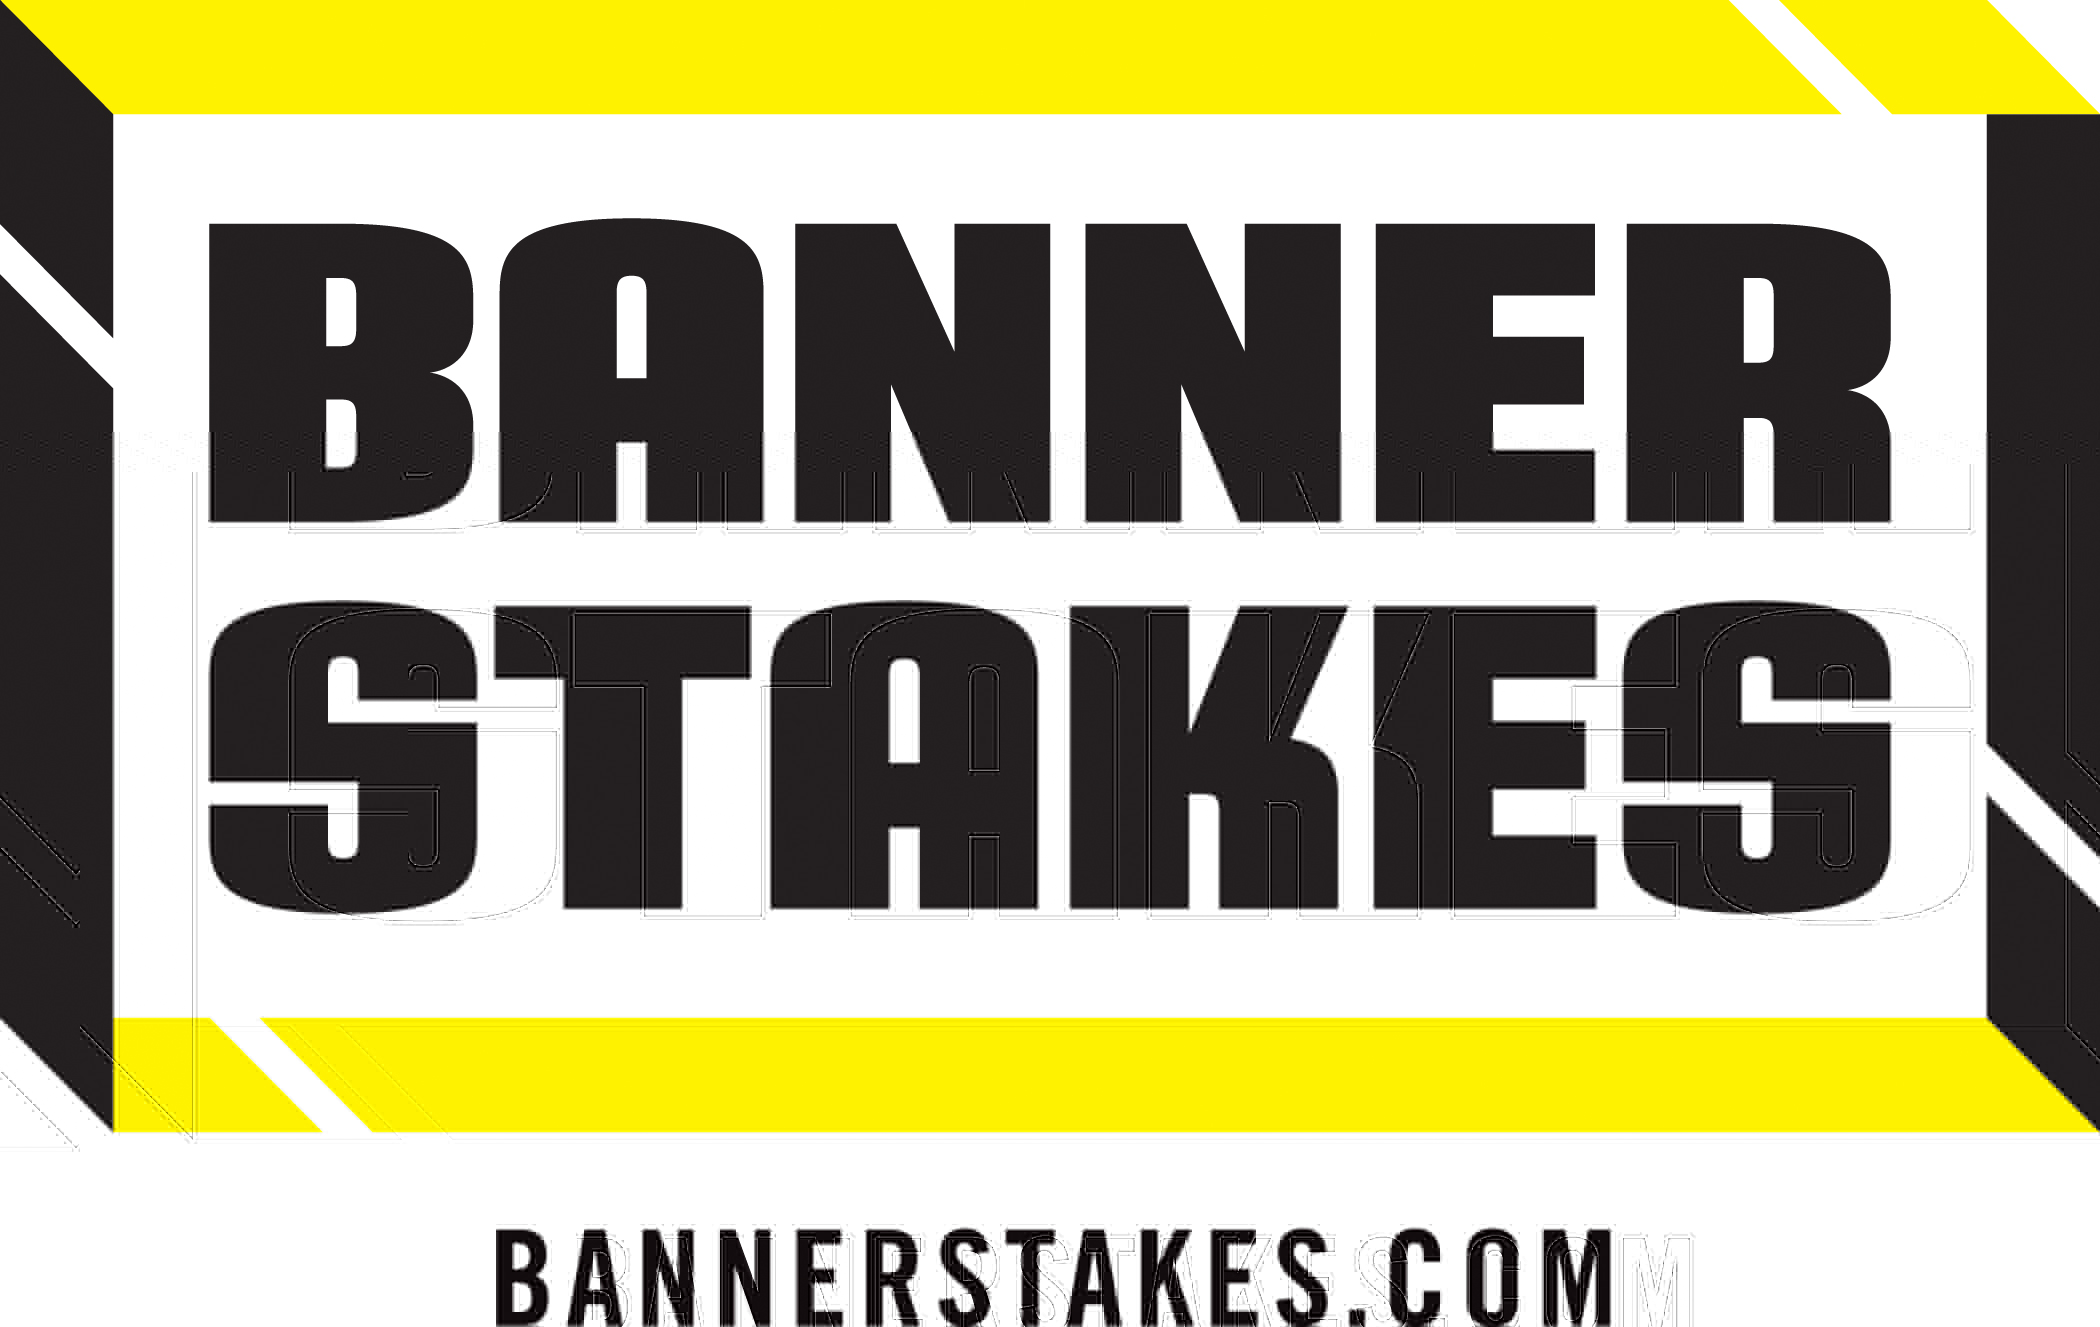 Banner-Stakes-yellow-black-logo-website